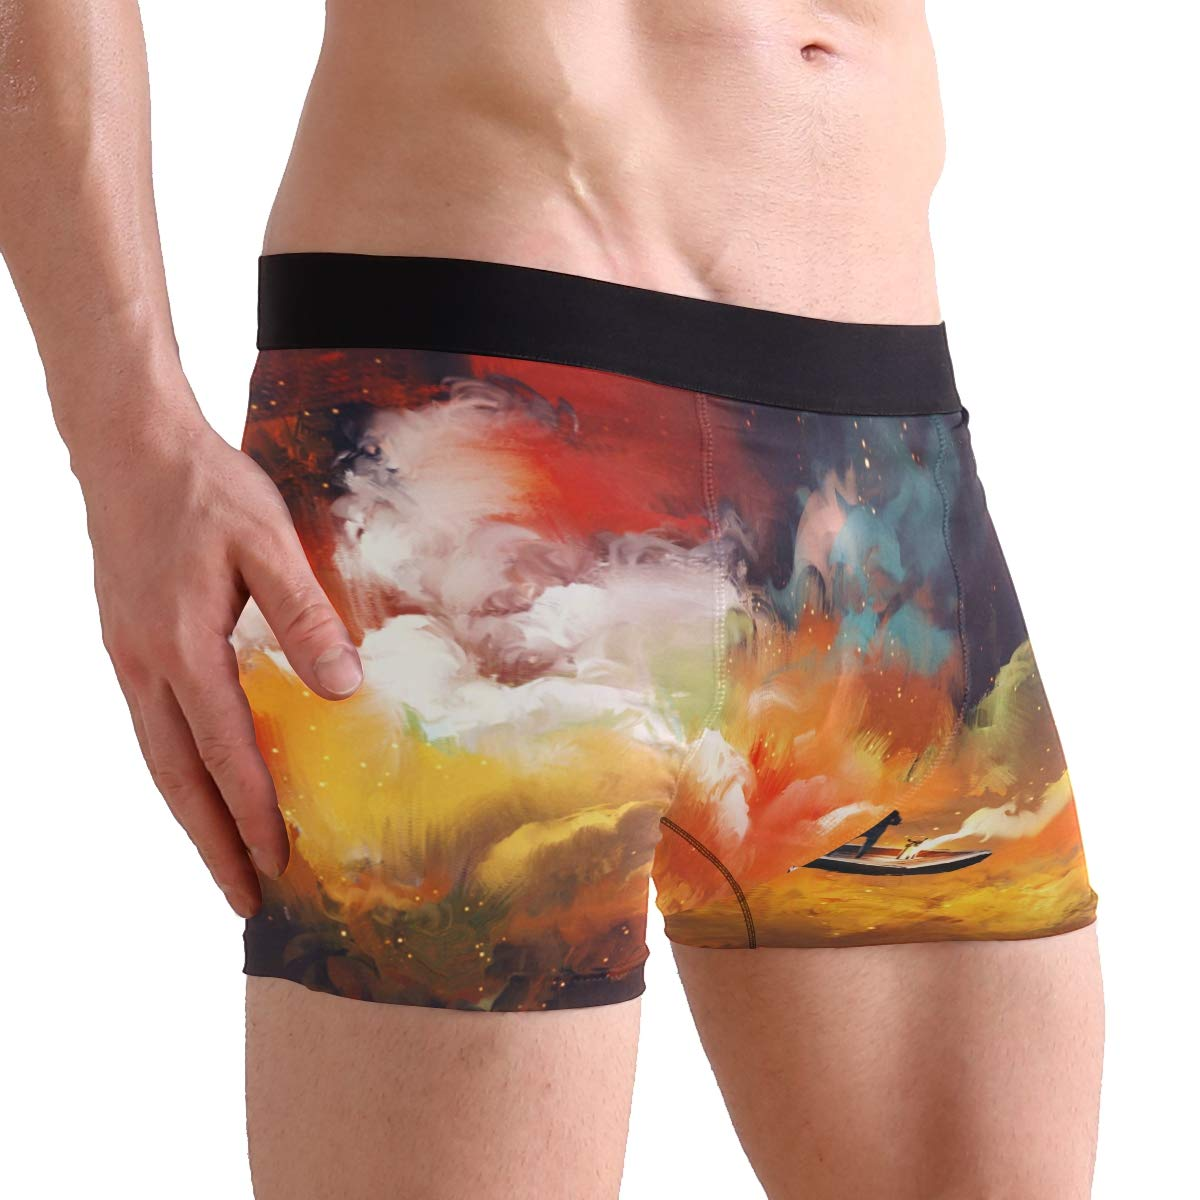 Man On Boat Floating Nebula Cloud Boxer Briefs Mens Underwear Pack Seamless Comfort Soft